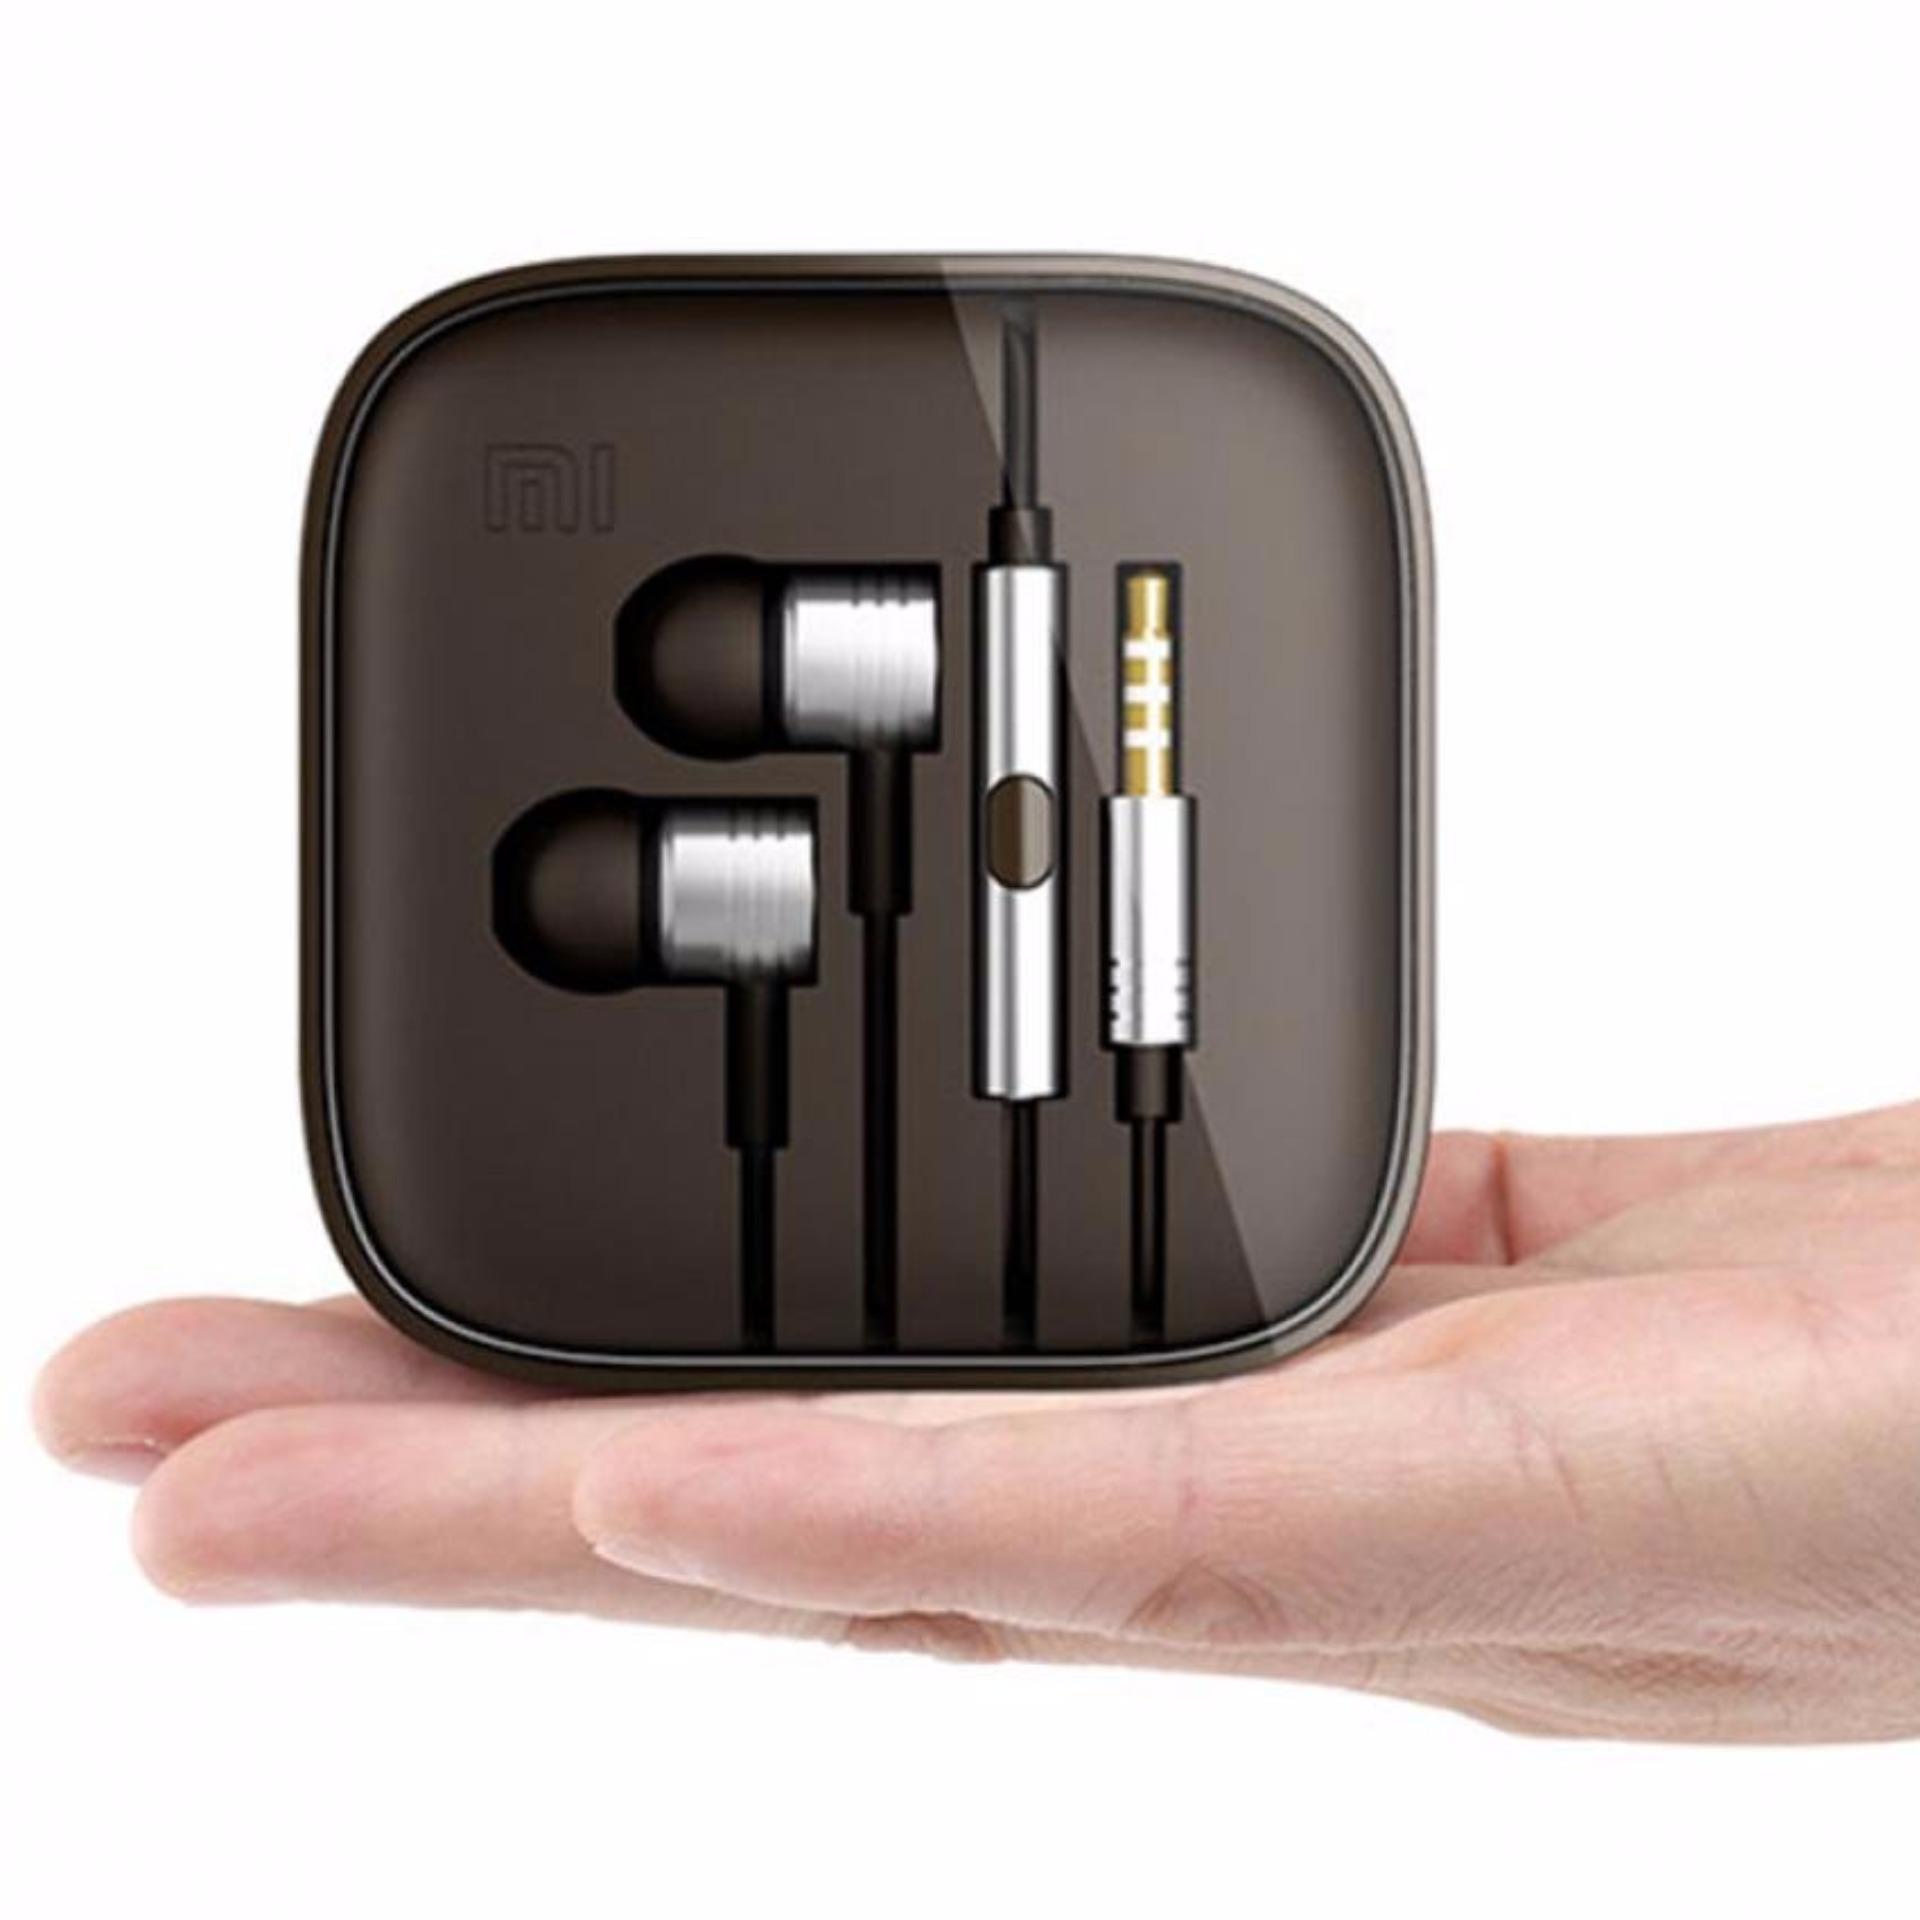 Xiaomi Earphone Big Bass Piston Mi 2nd Generation Handsfree/Headset- Silver